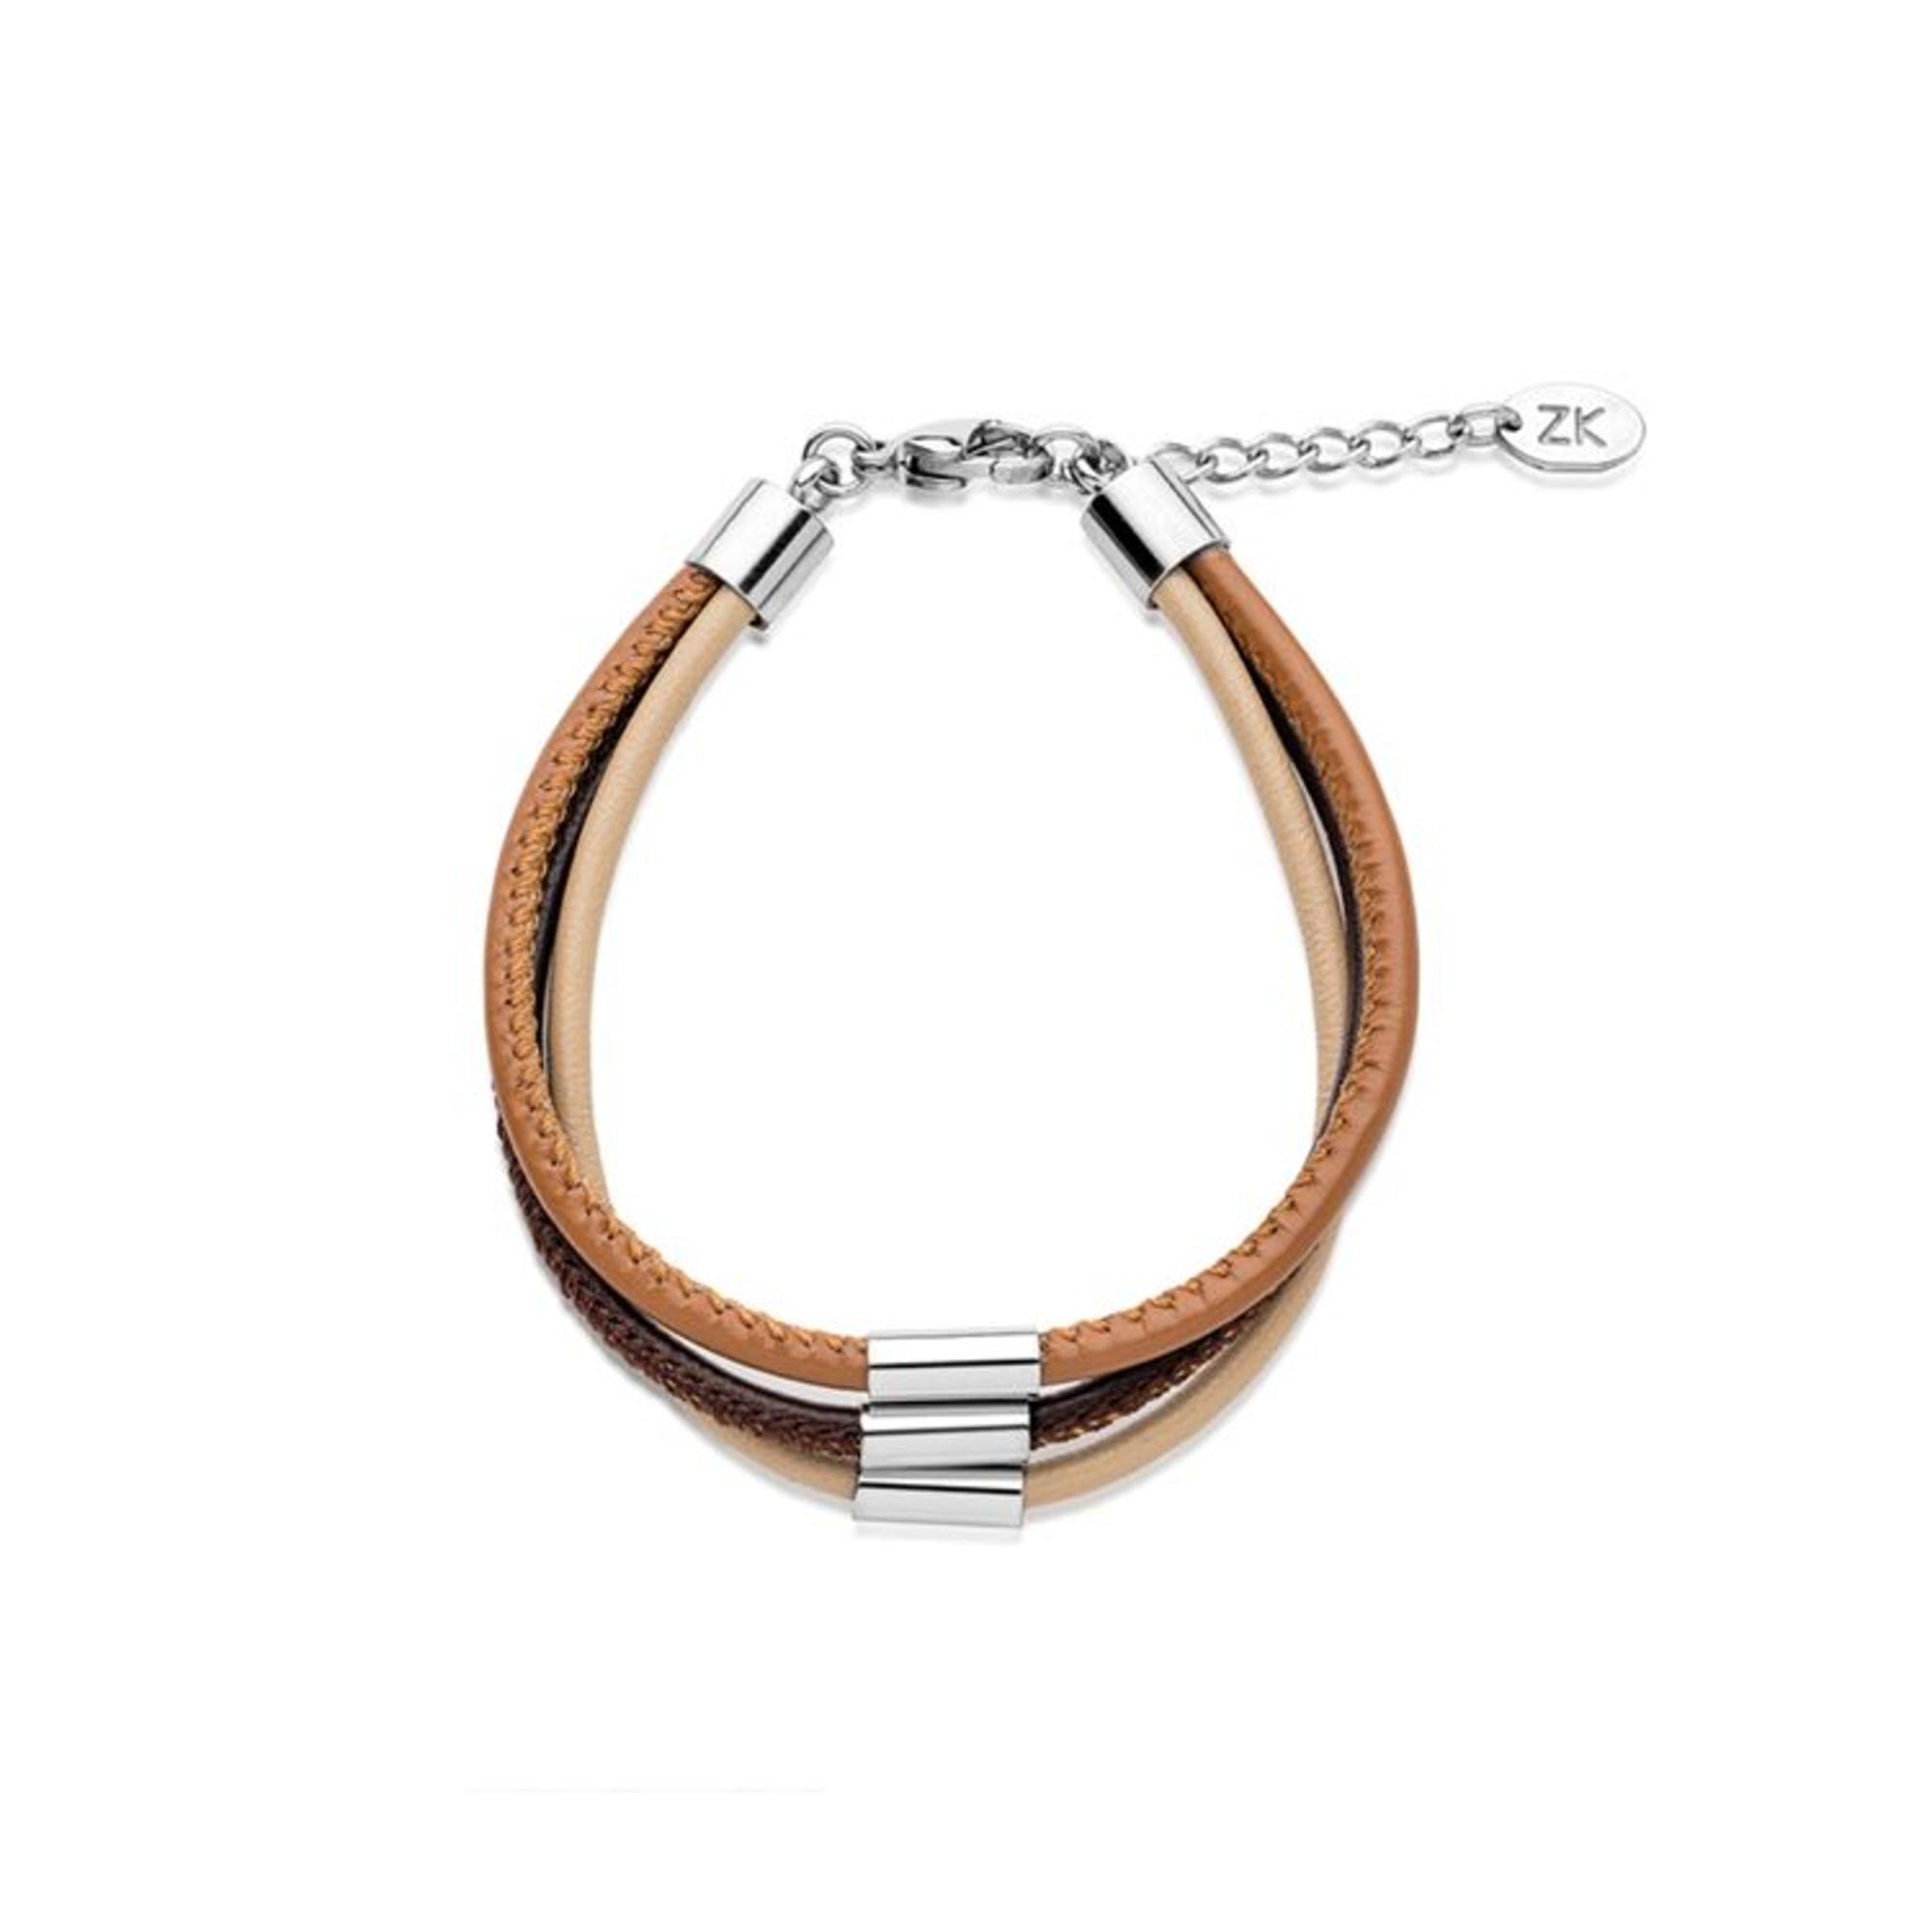 Bracelet ZABOK Marron